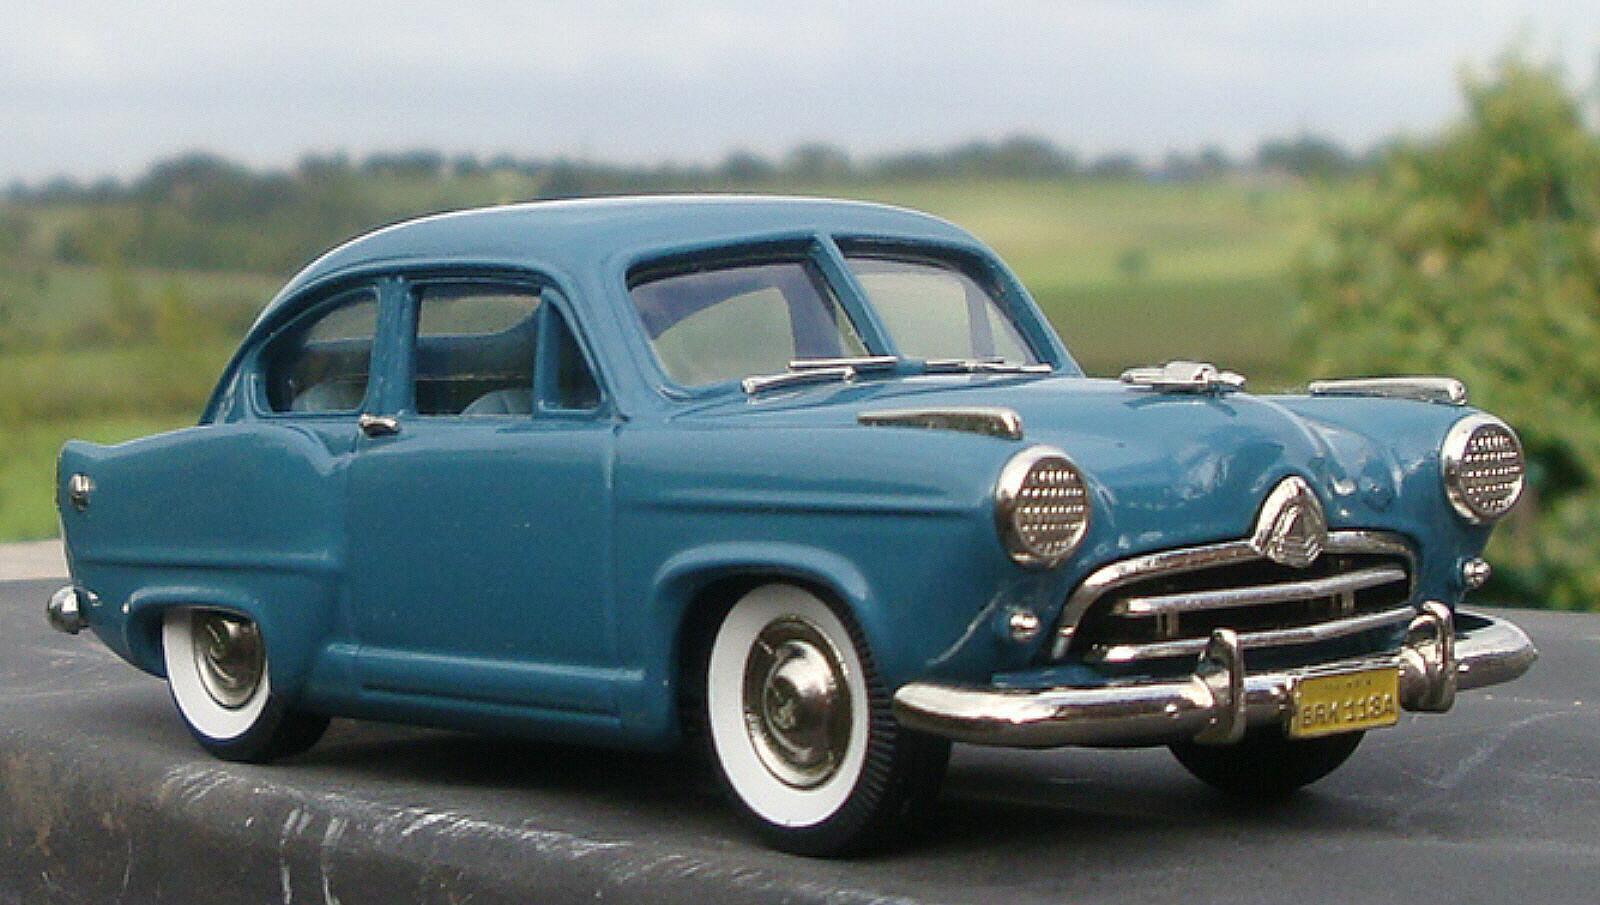 Brooklin modelle 1952 allstate de luxe - modell.